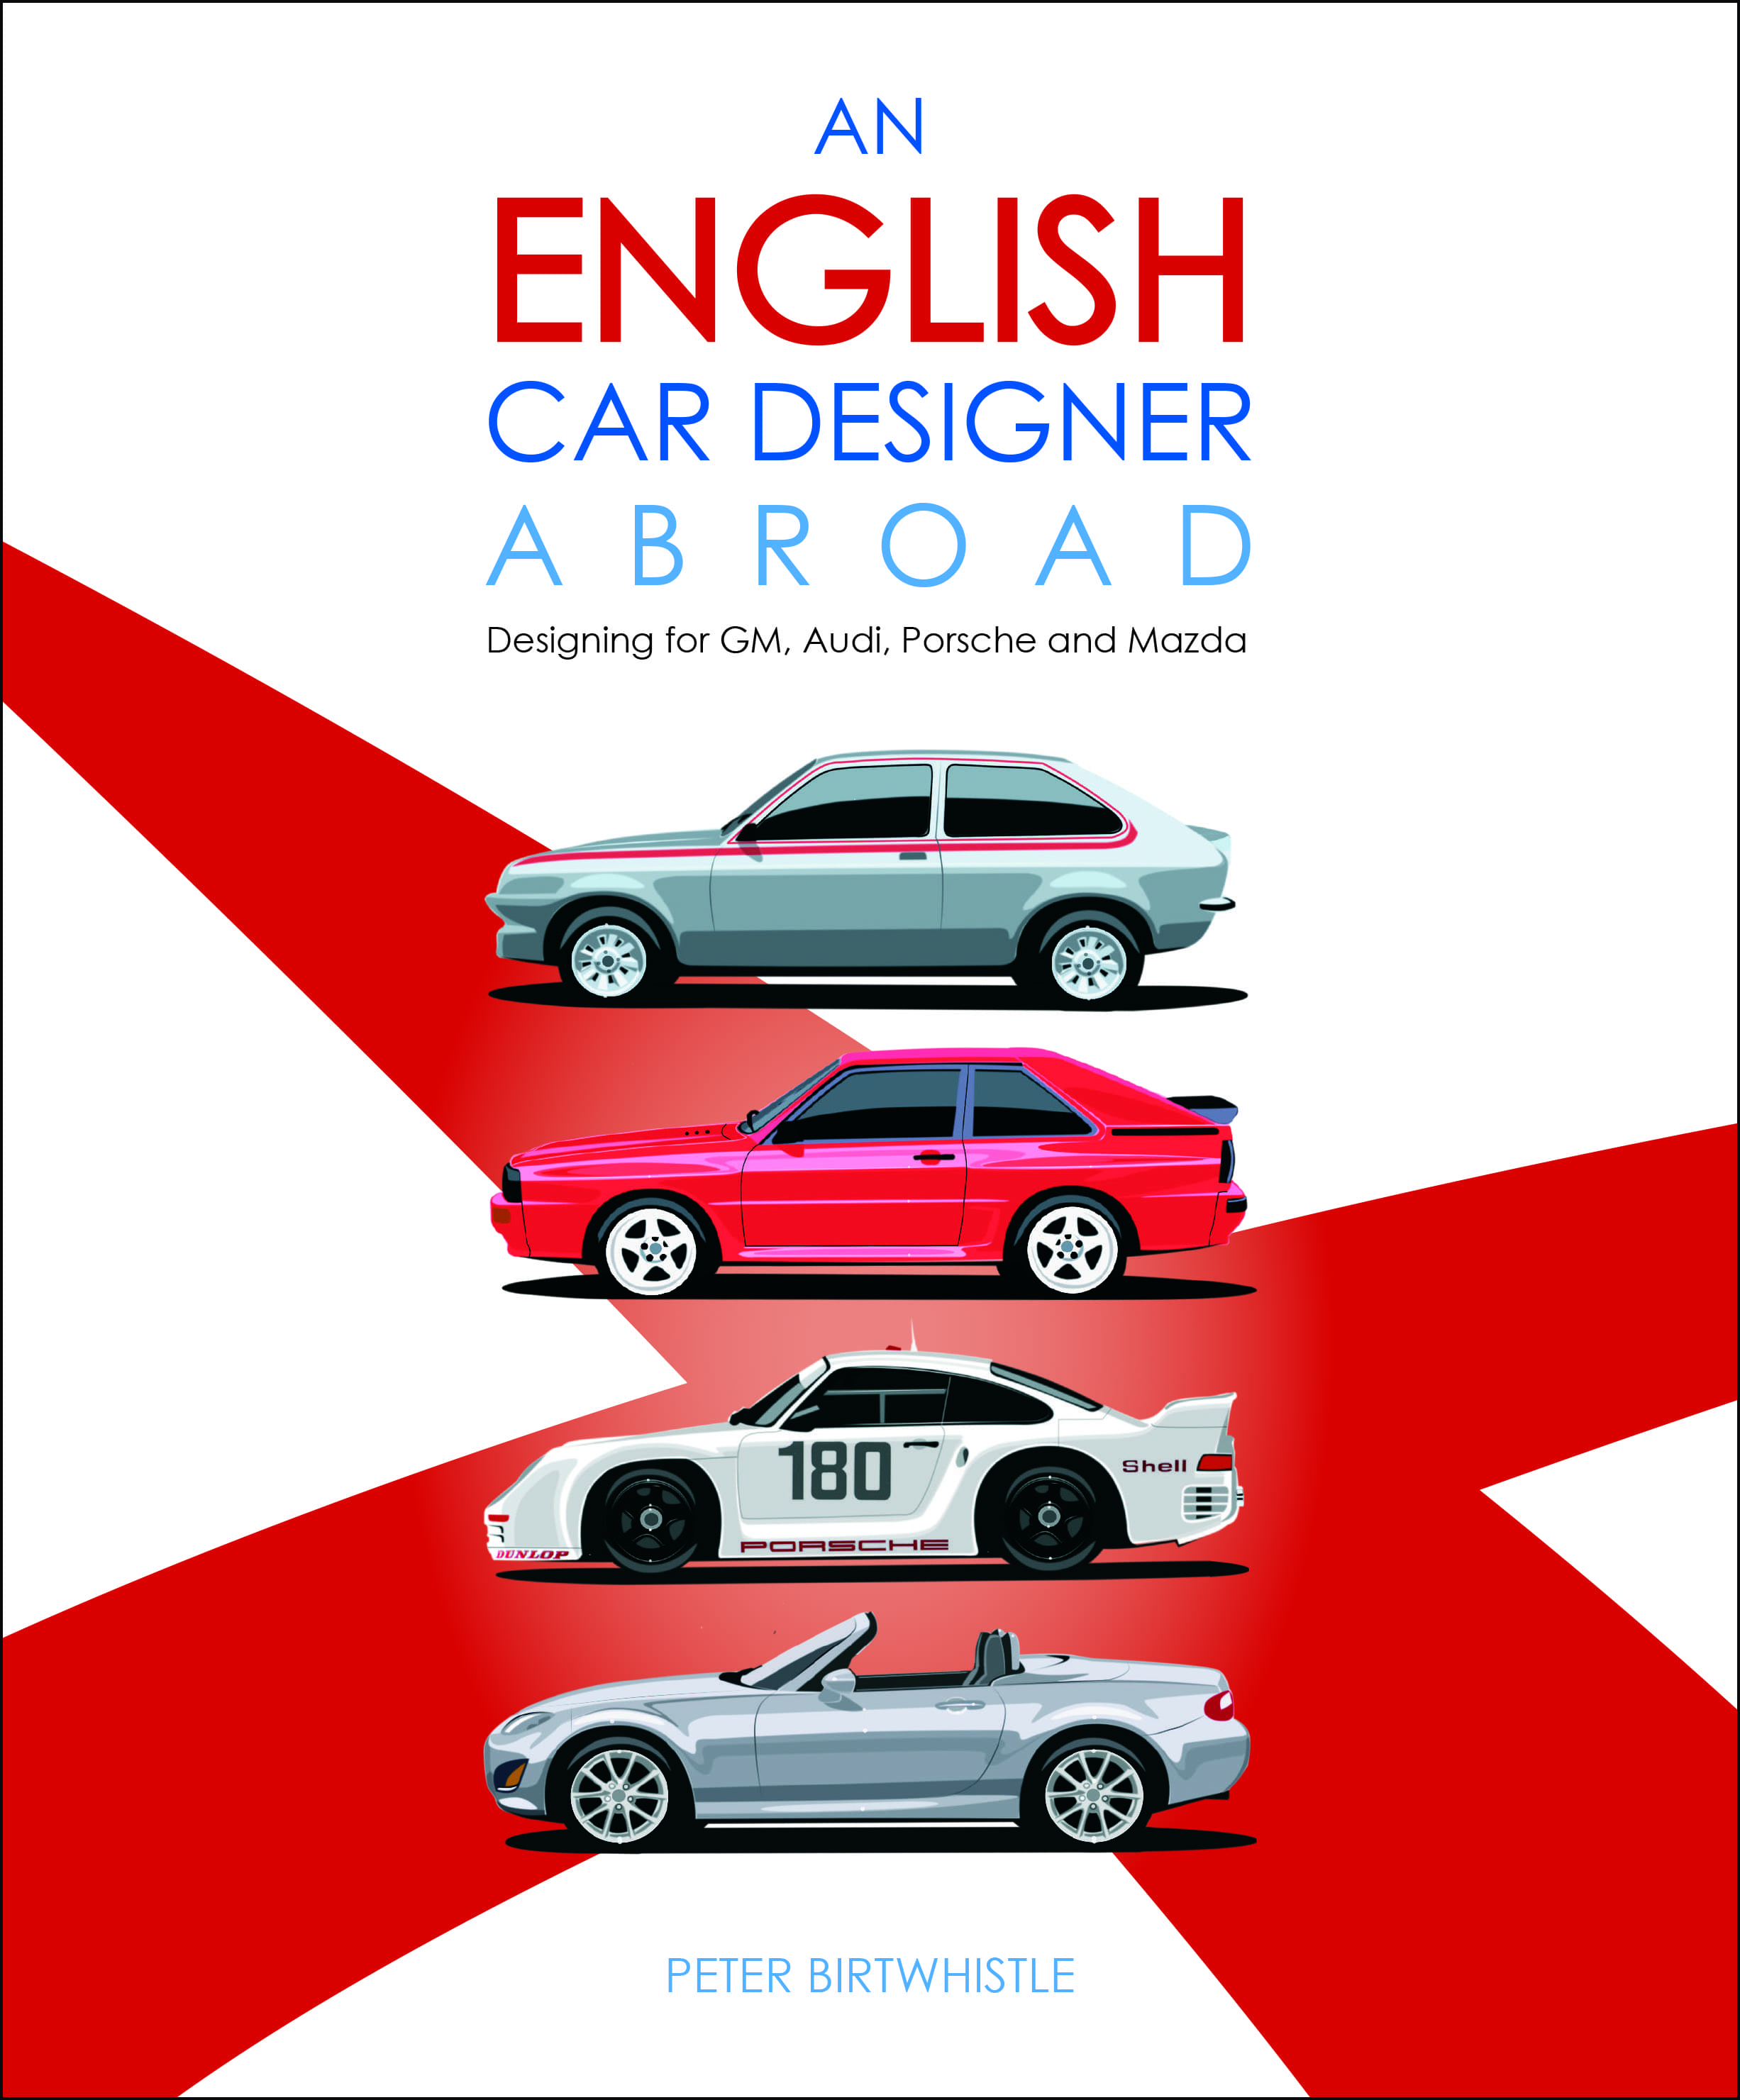 An English Car Designer Abroad cover